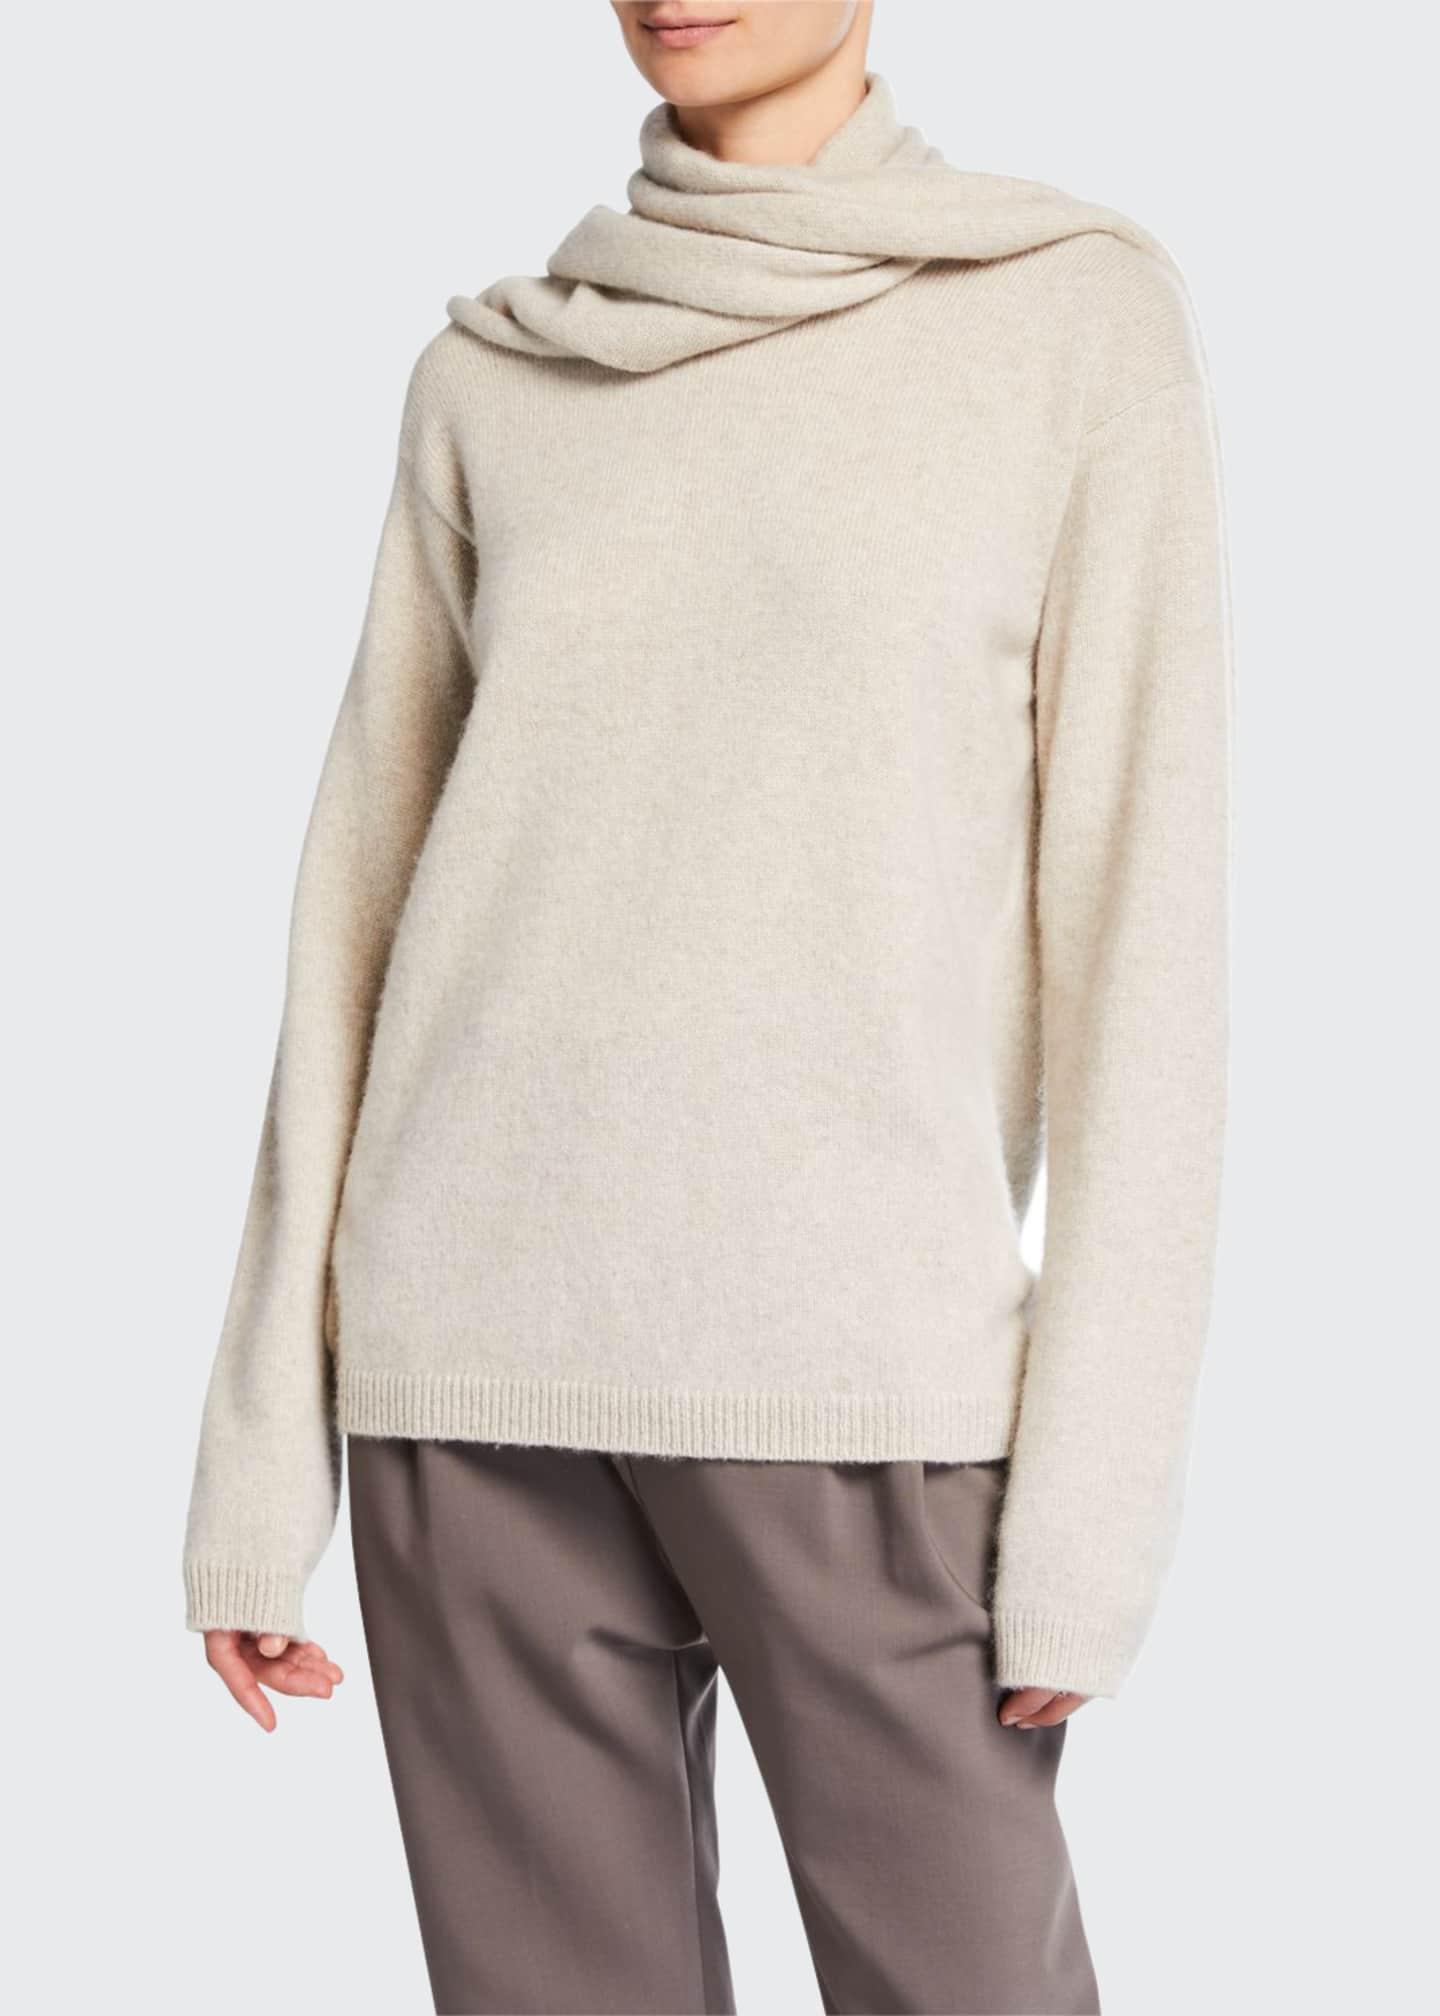 Deveaux New York Cashmere Scarf Sweater